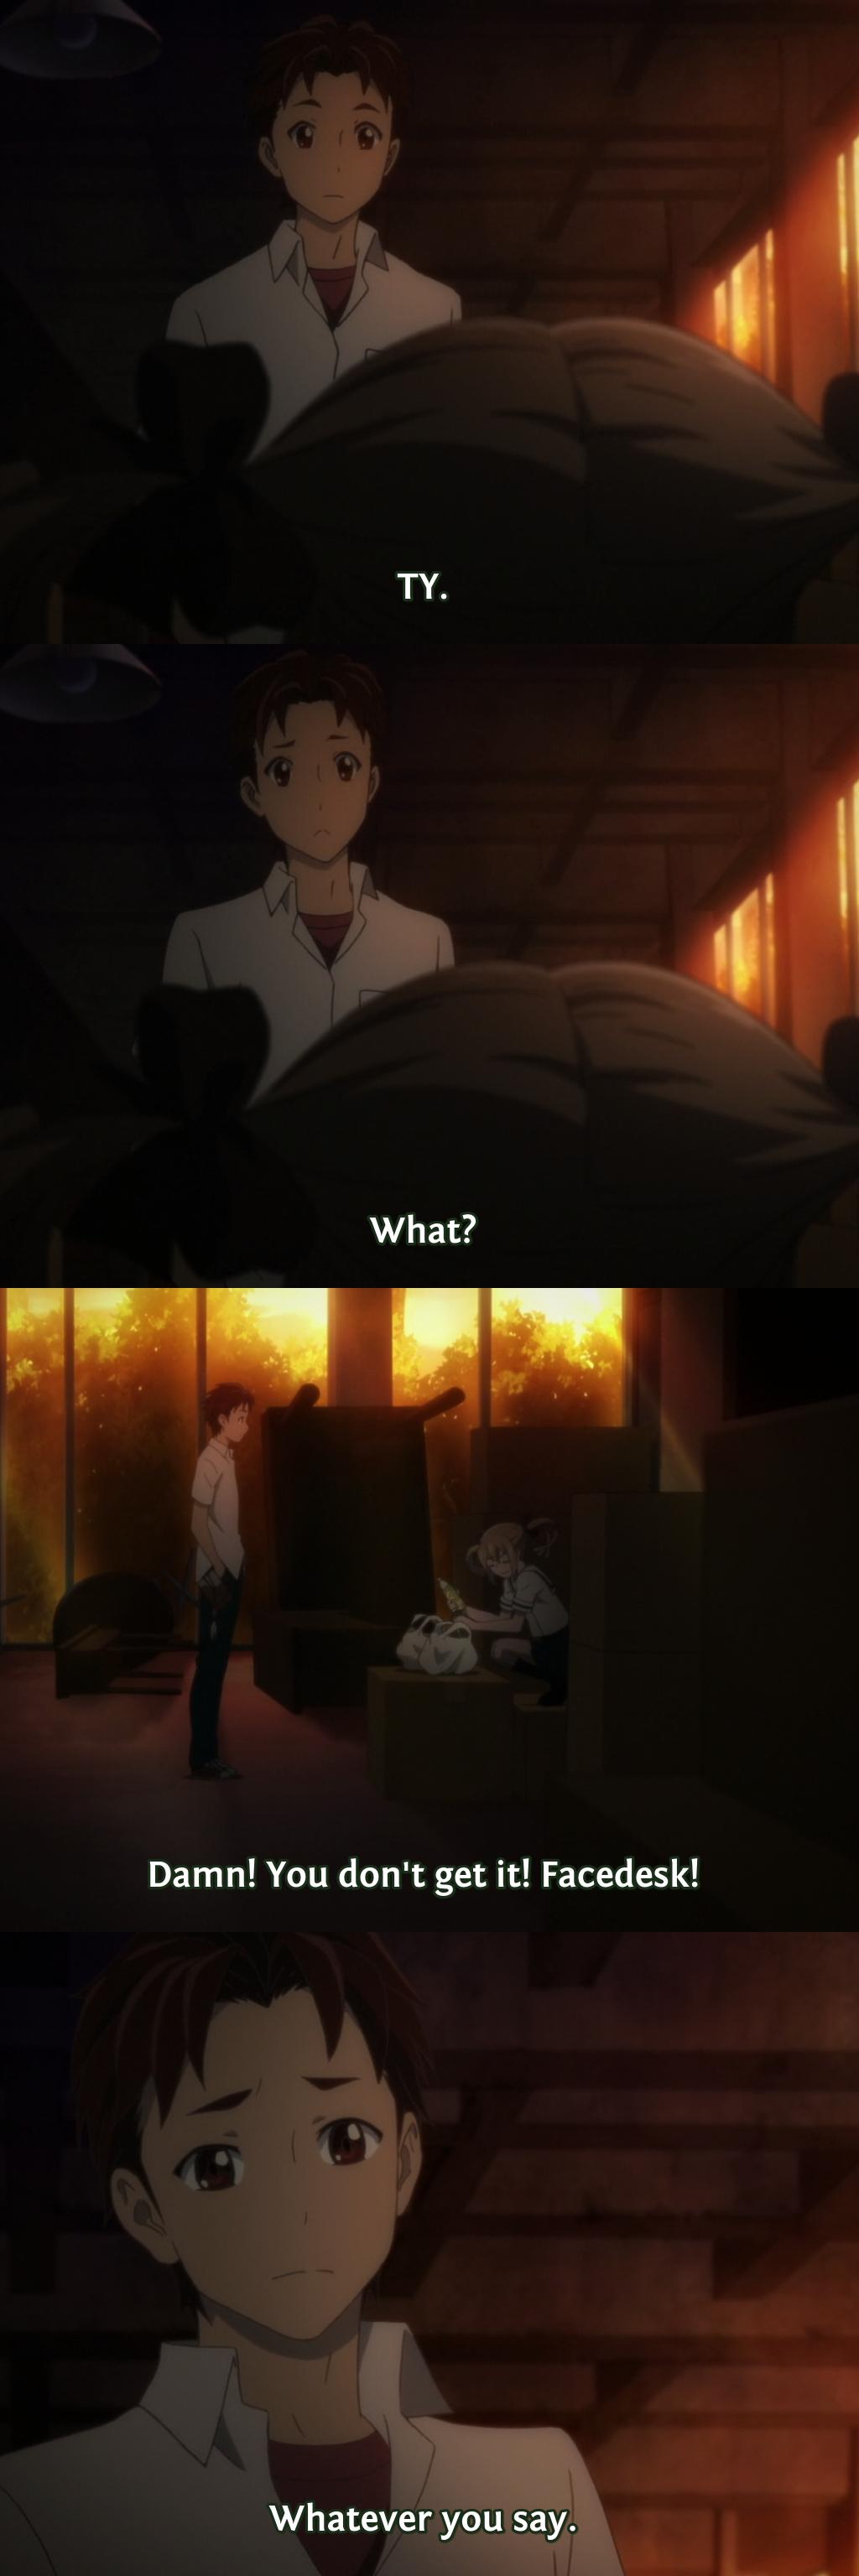 Using internet talk IRL. anime is Robotics;Notes.